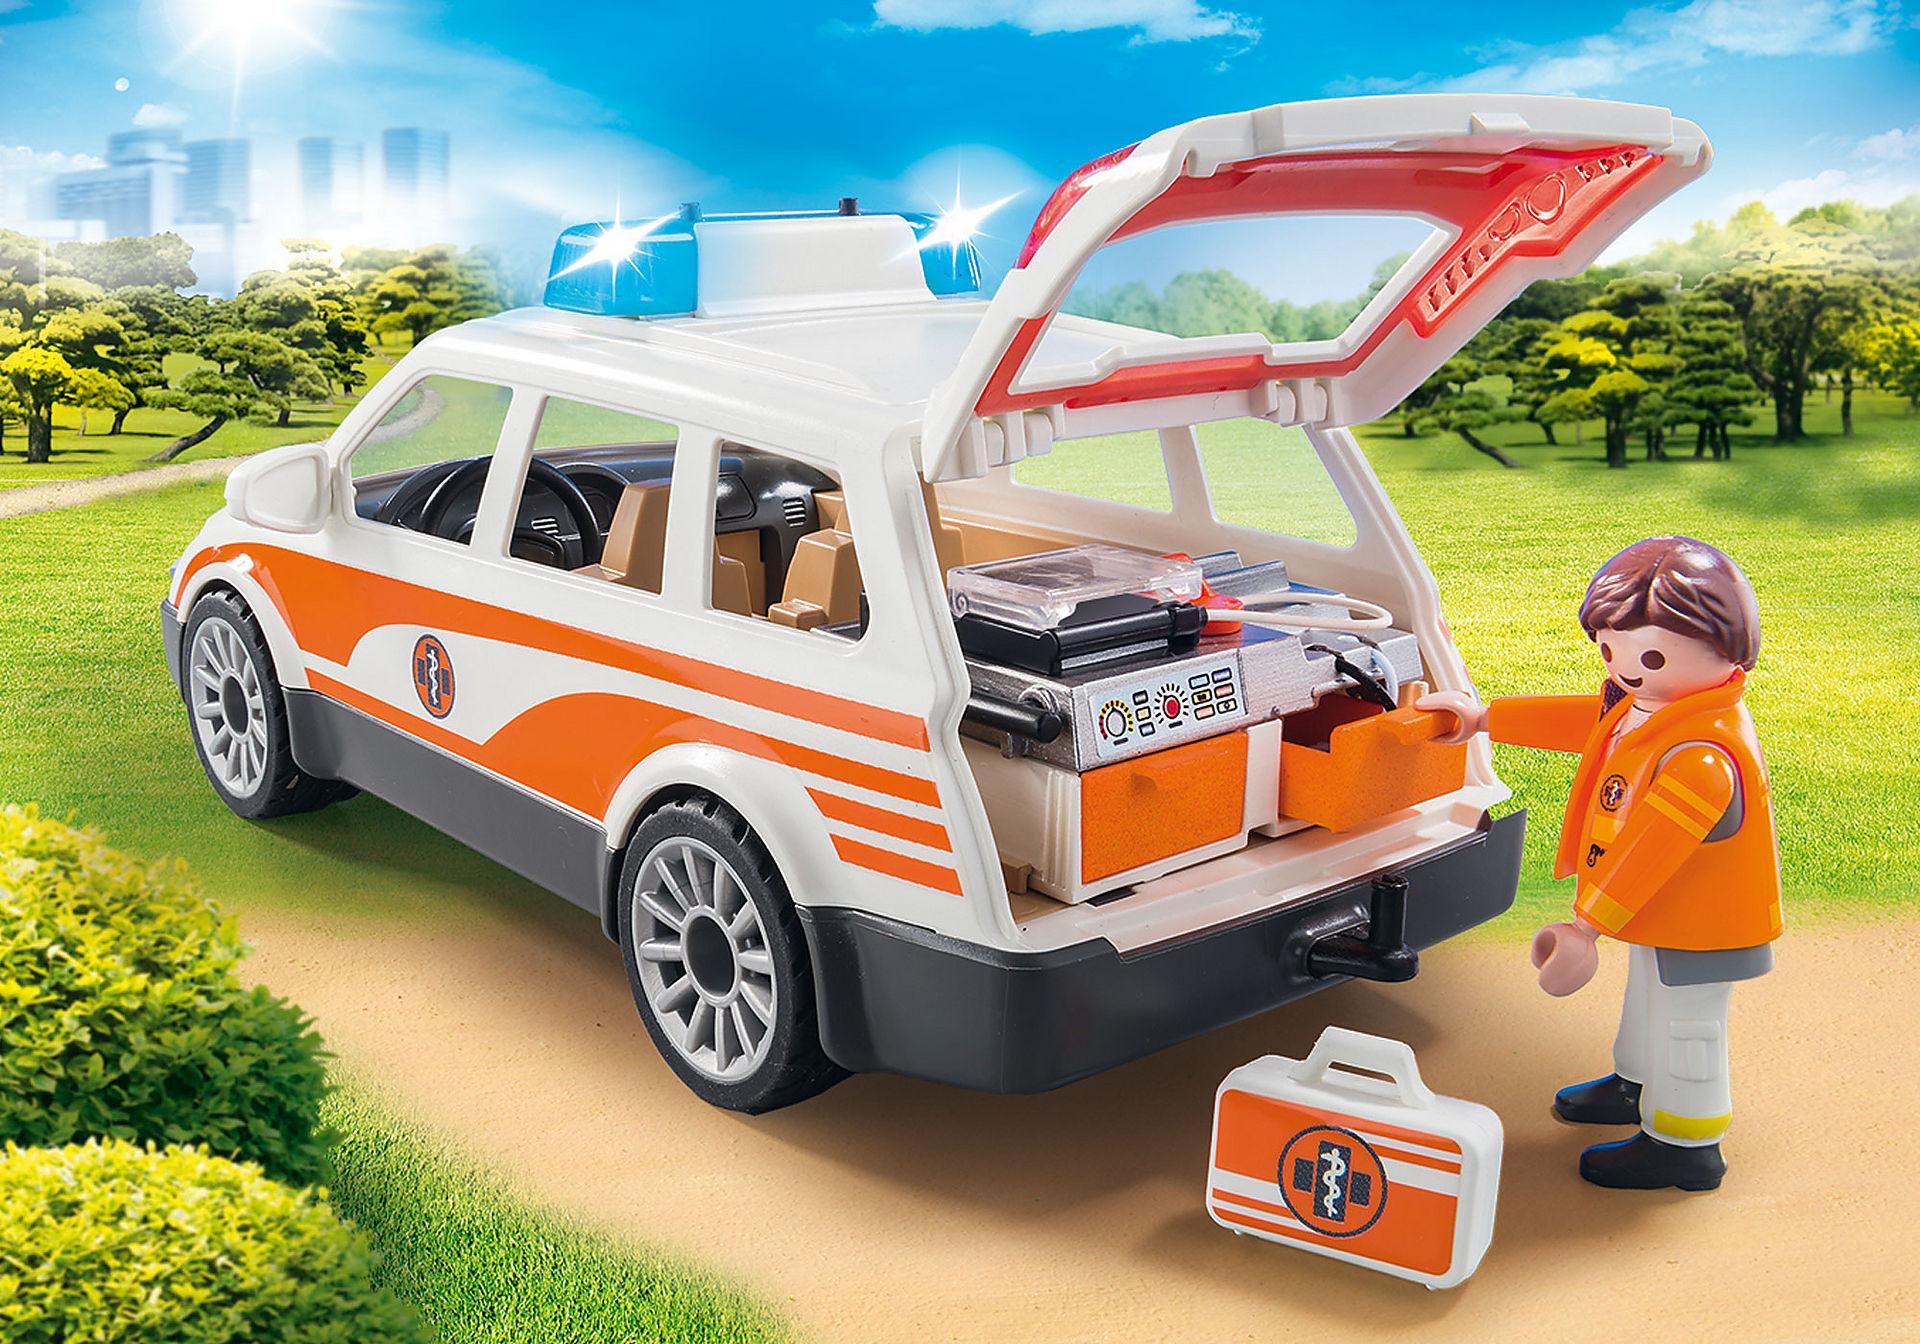 http://media.playmobil.com/i/playmobil/70050_product_extra1/Voiture et ambulanciers